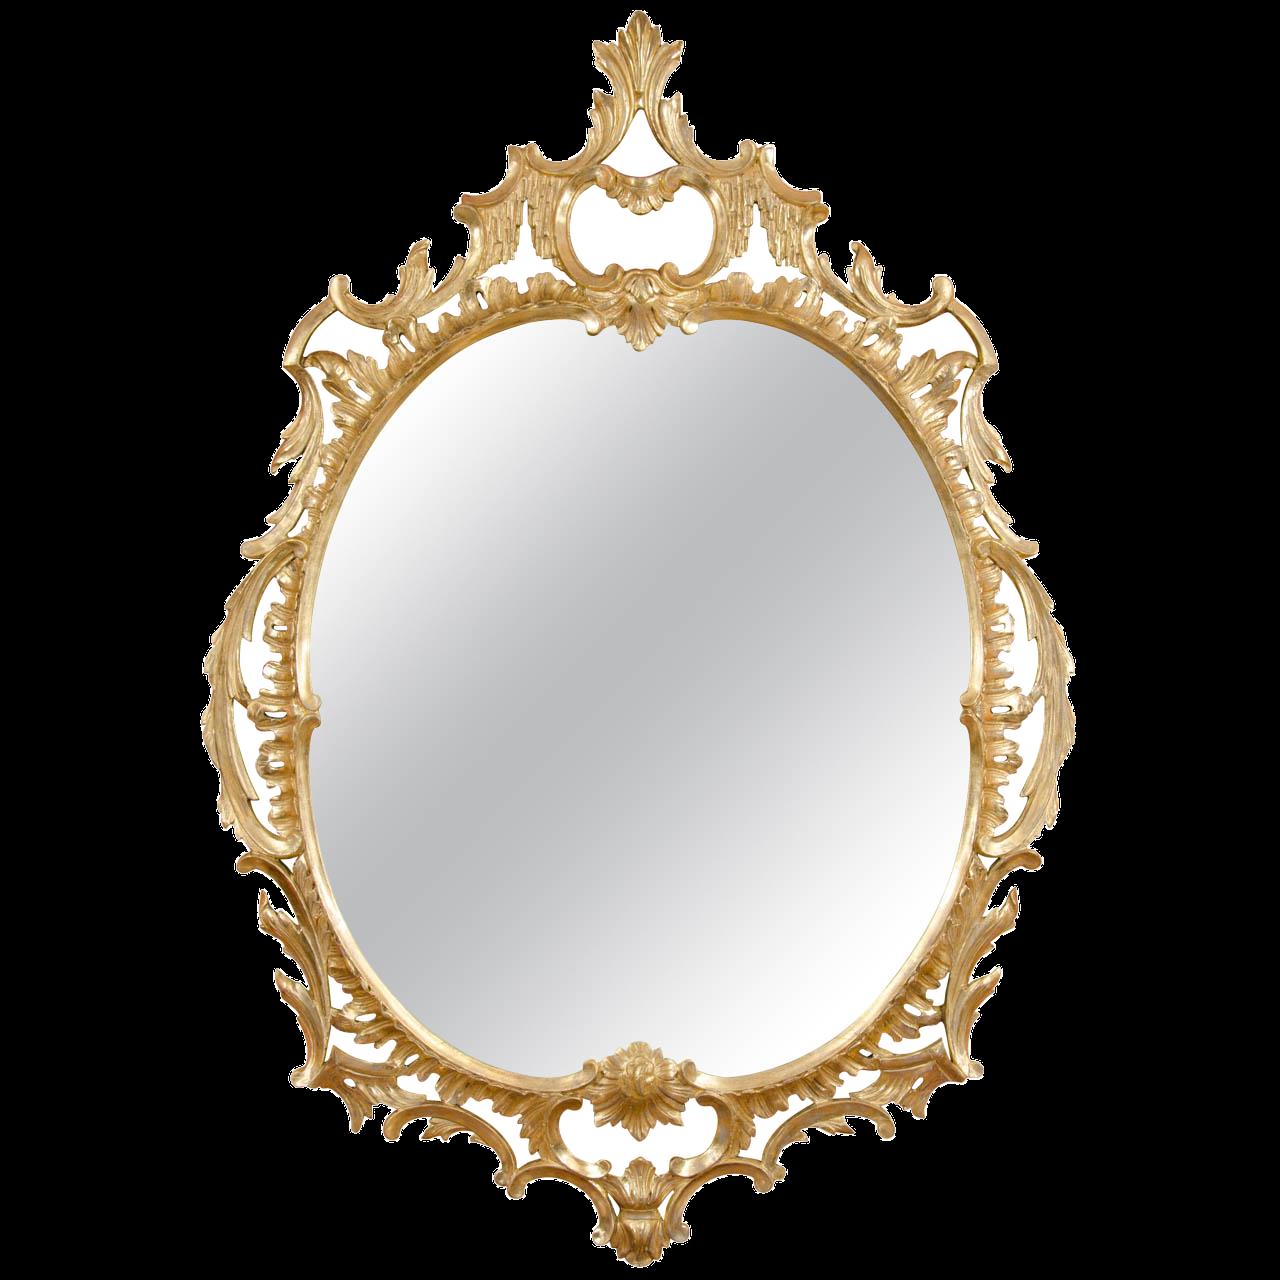 Download Mirror Transparent Hq Png Image Freepngimg